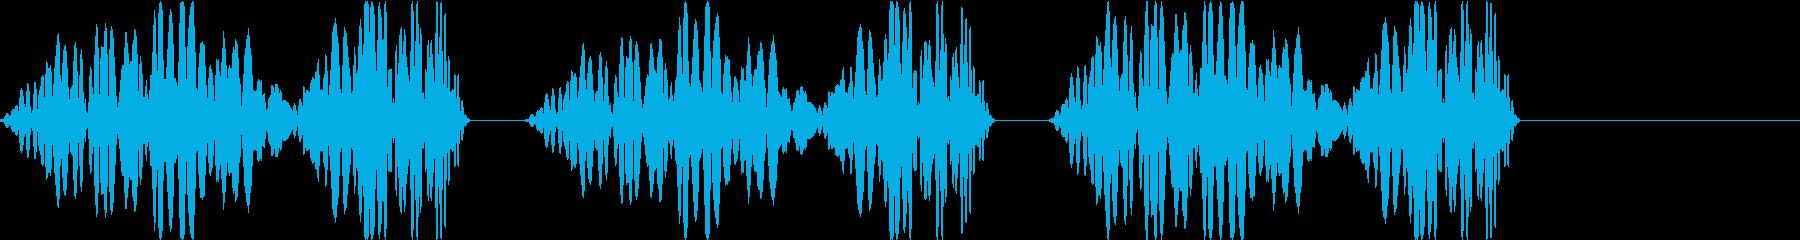 DJプレイ スクラッチ・ノイズ 253の再生済みの波形